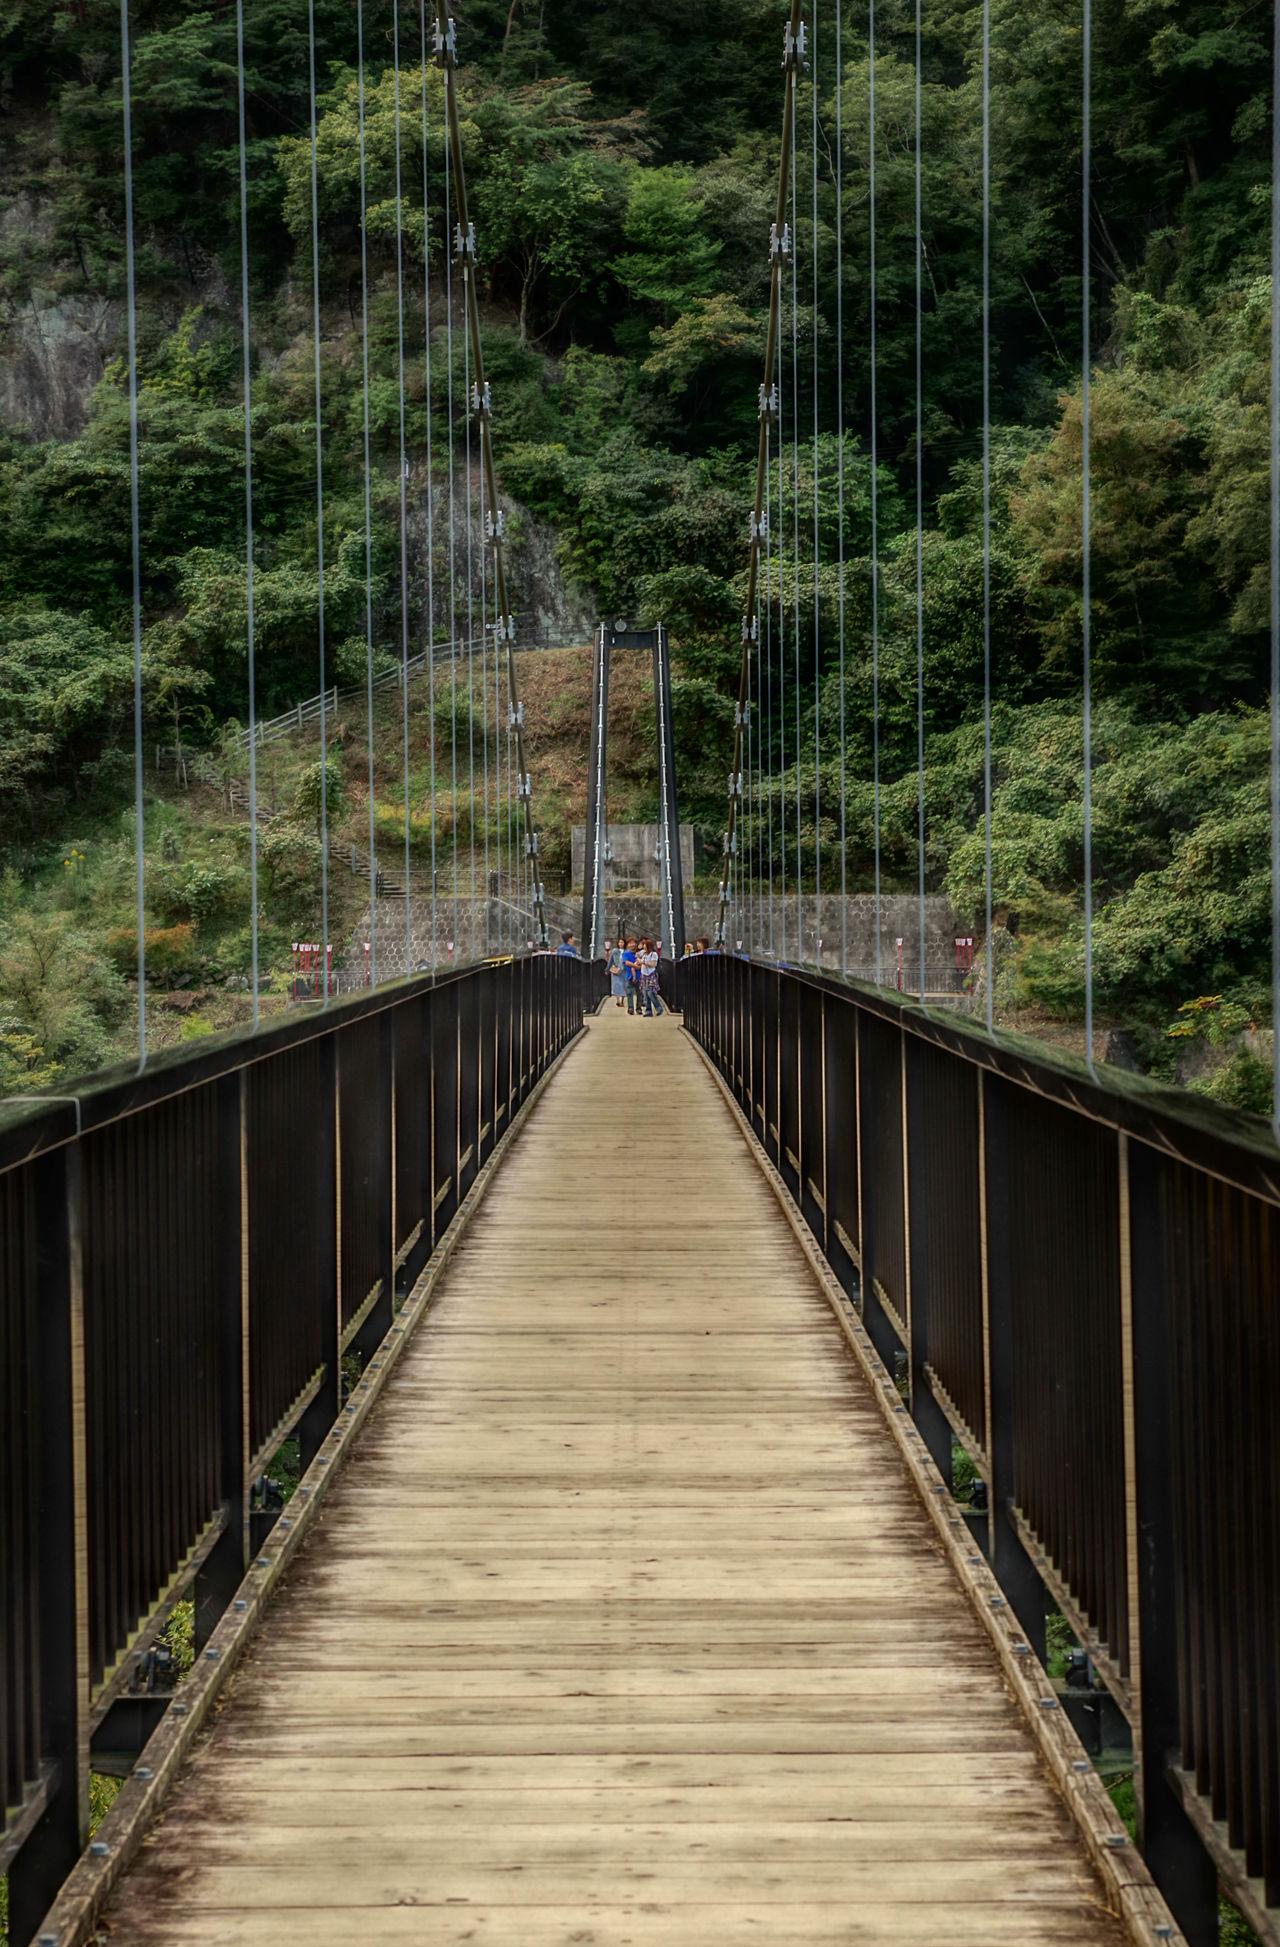 Suspension Bridge 鬼怒川 鬼怒川温泉 鬼怒楯岩大吊橋 日光 Hdr_gallery HDR Collection HDR